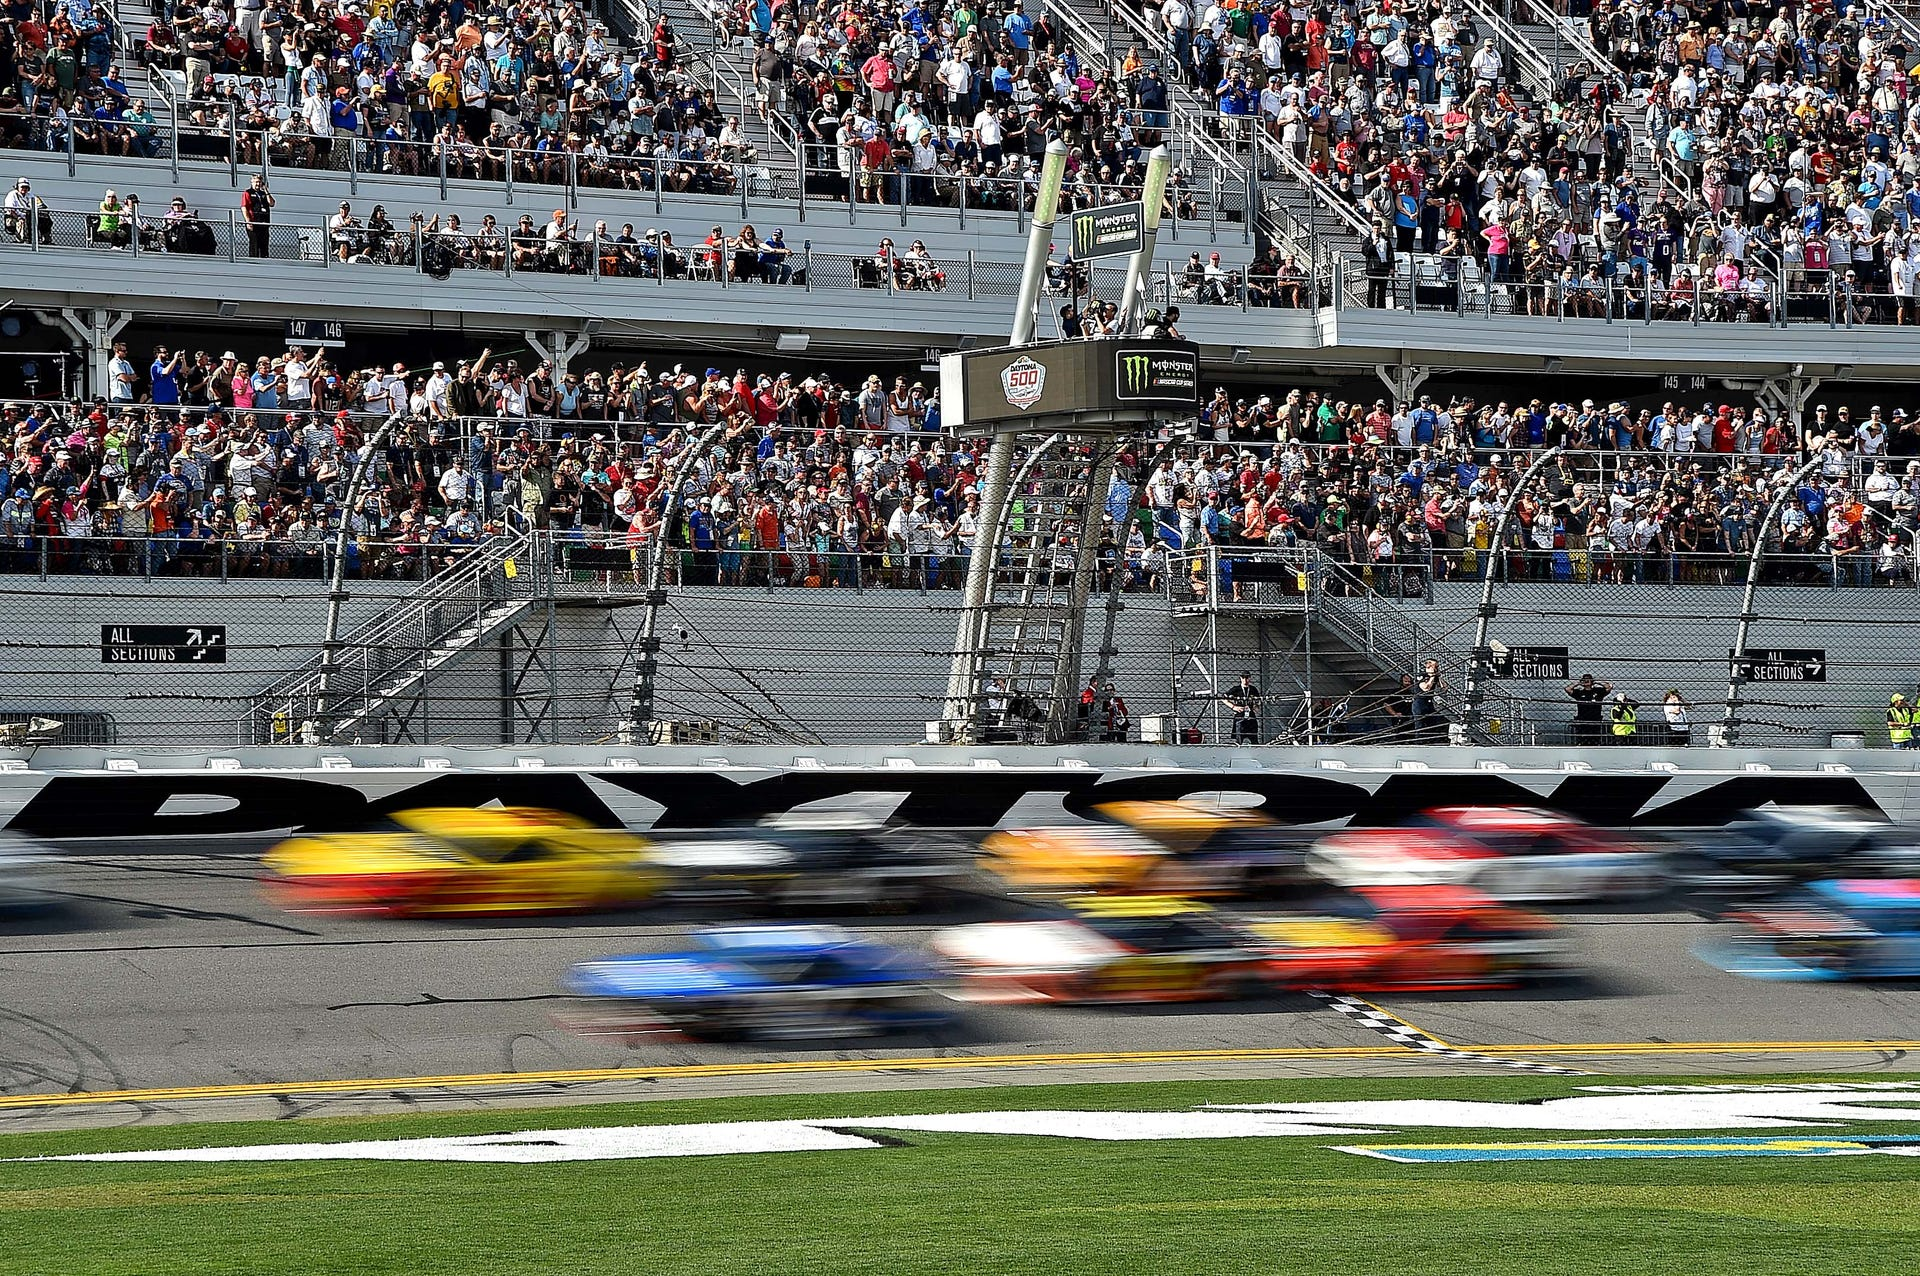 Daytona 500: Top photos from the 2019 NASCAR race